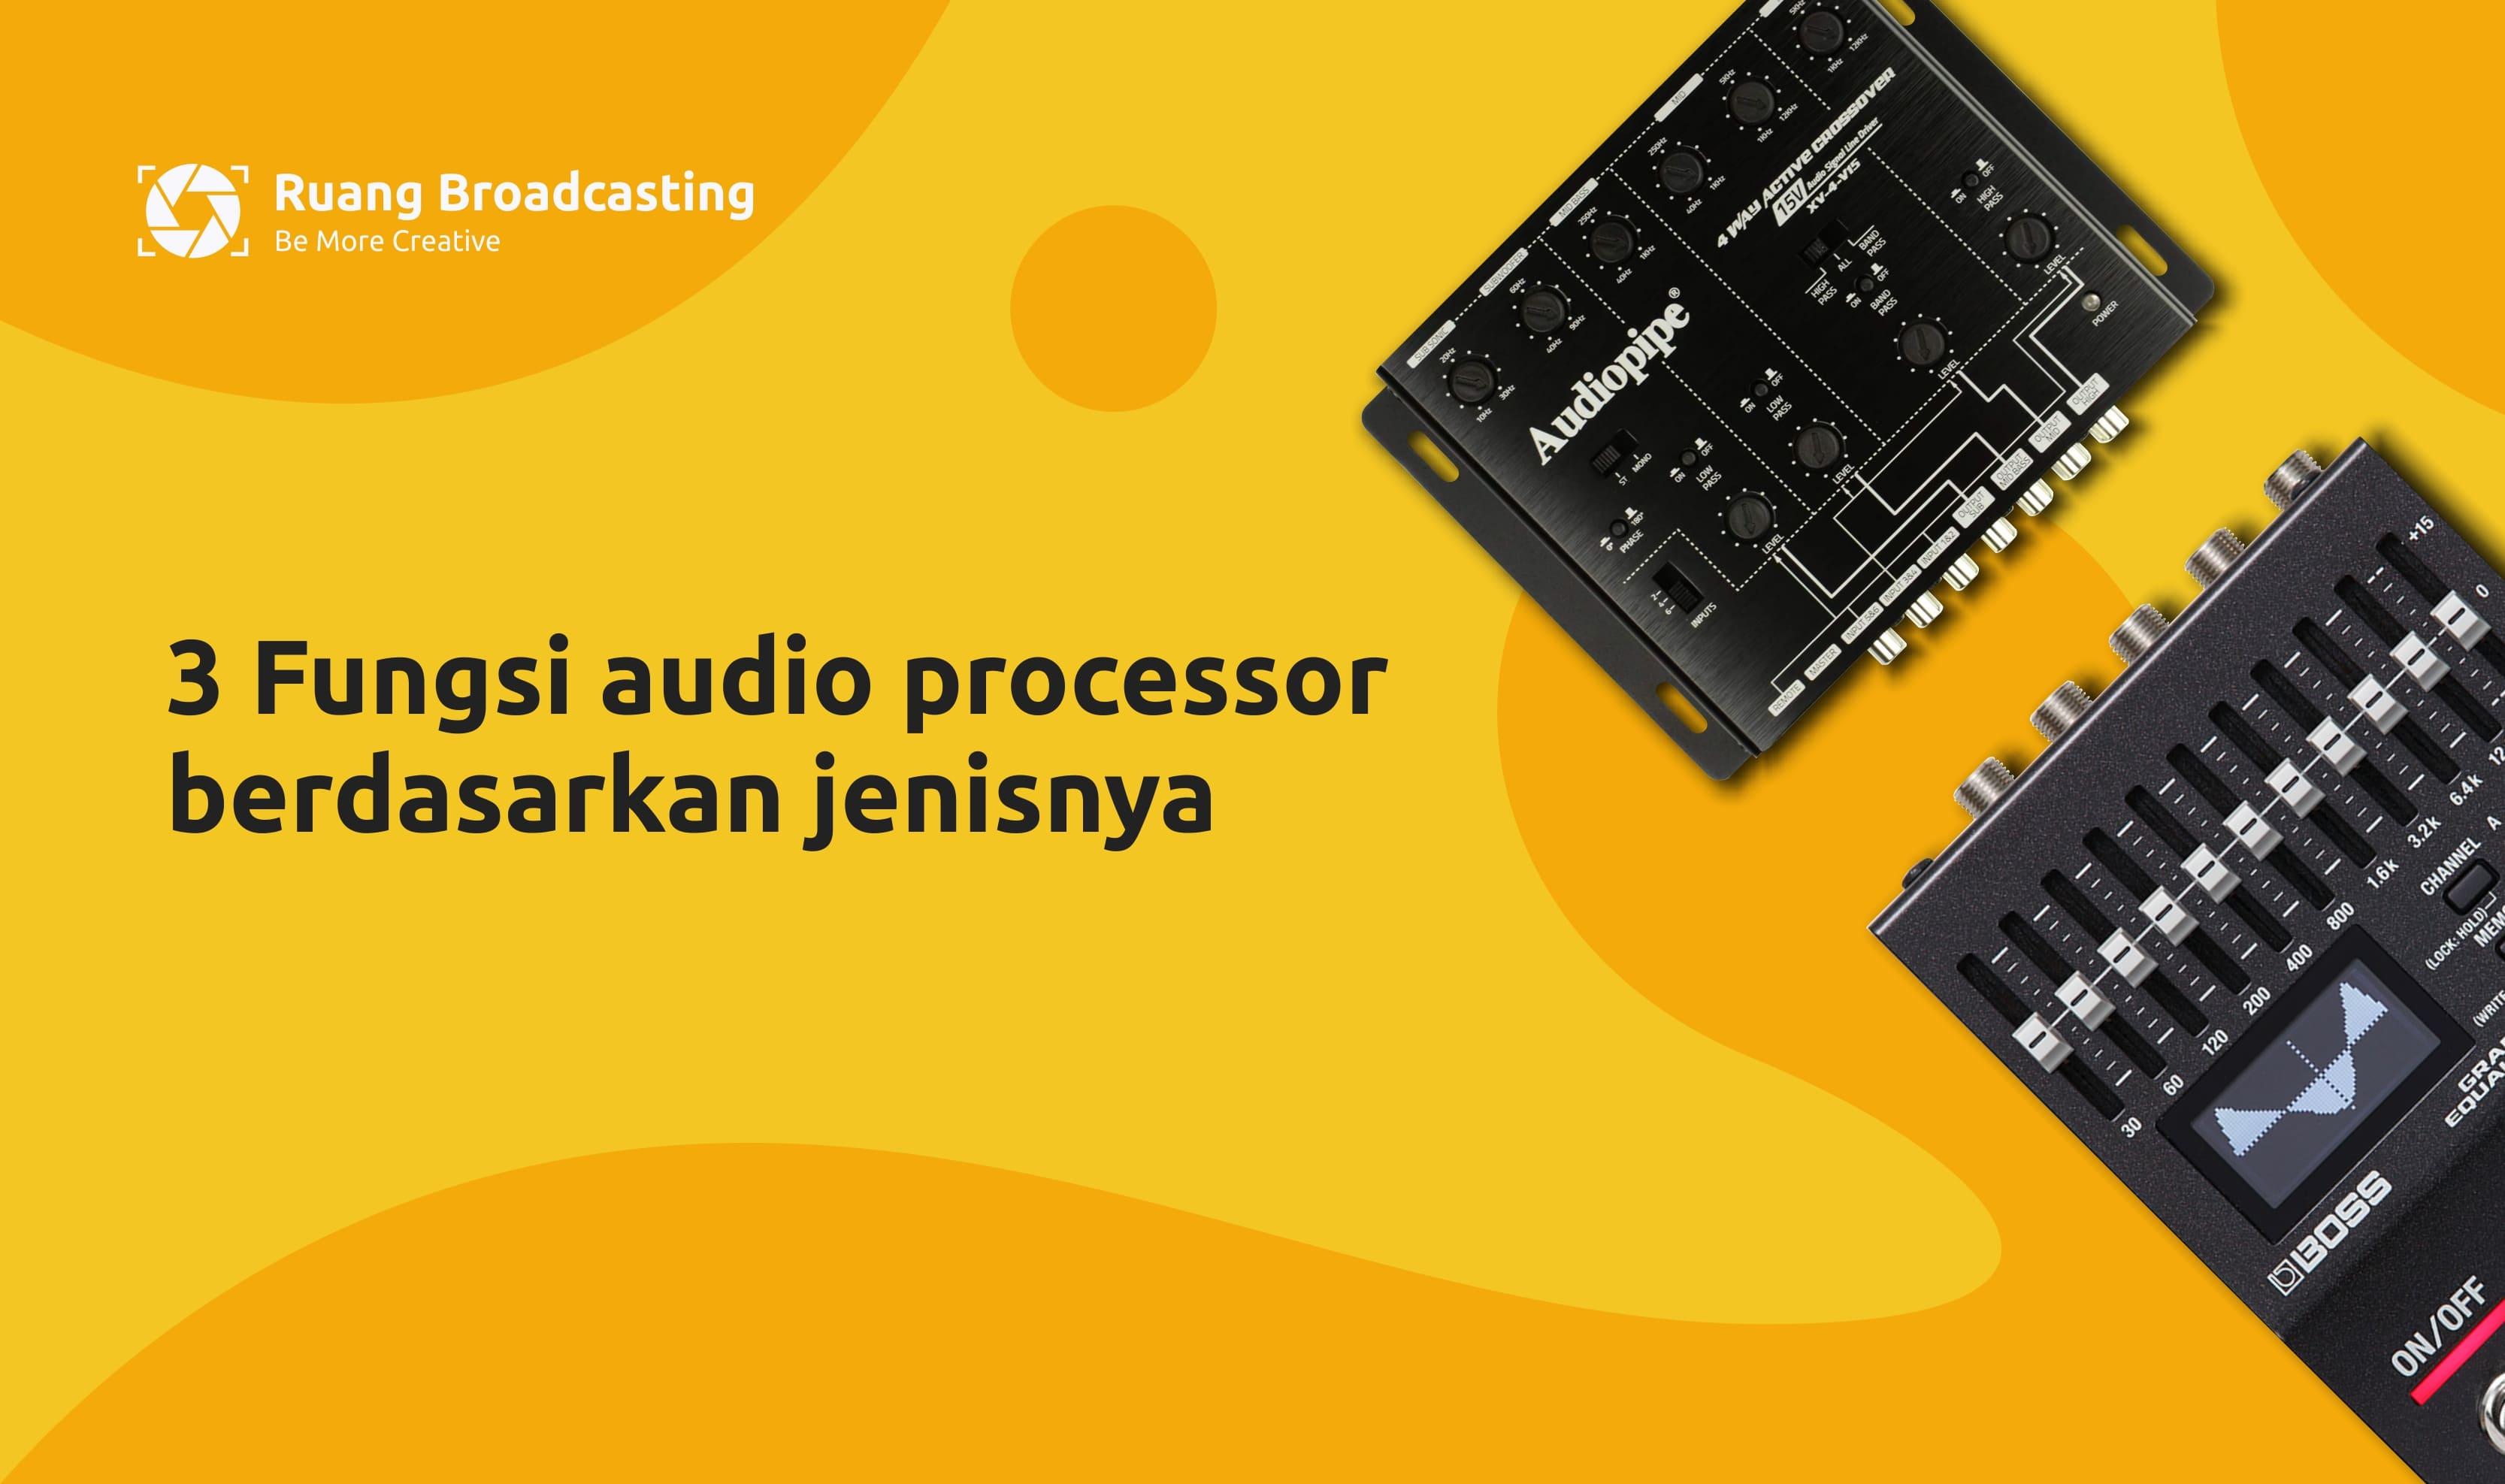 Fungsi audio processor